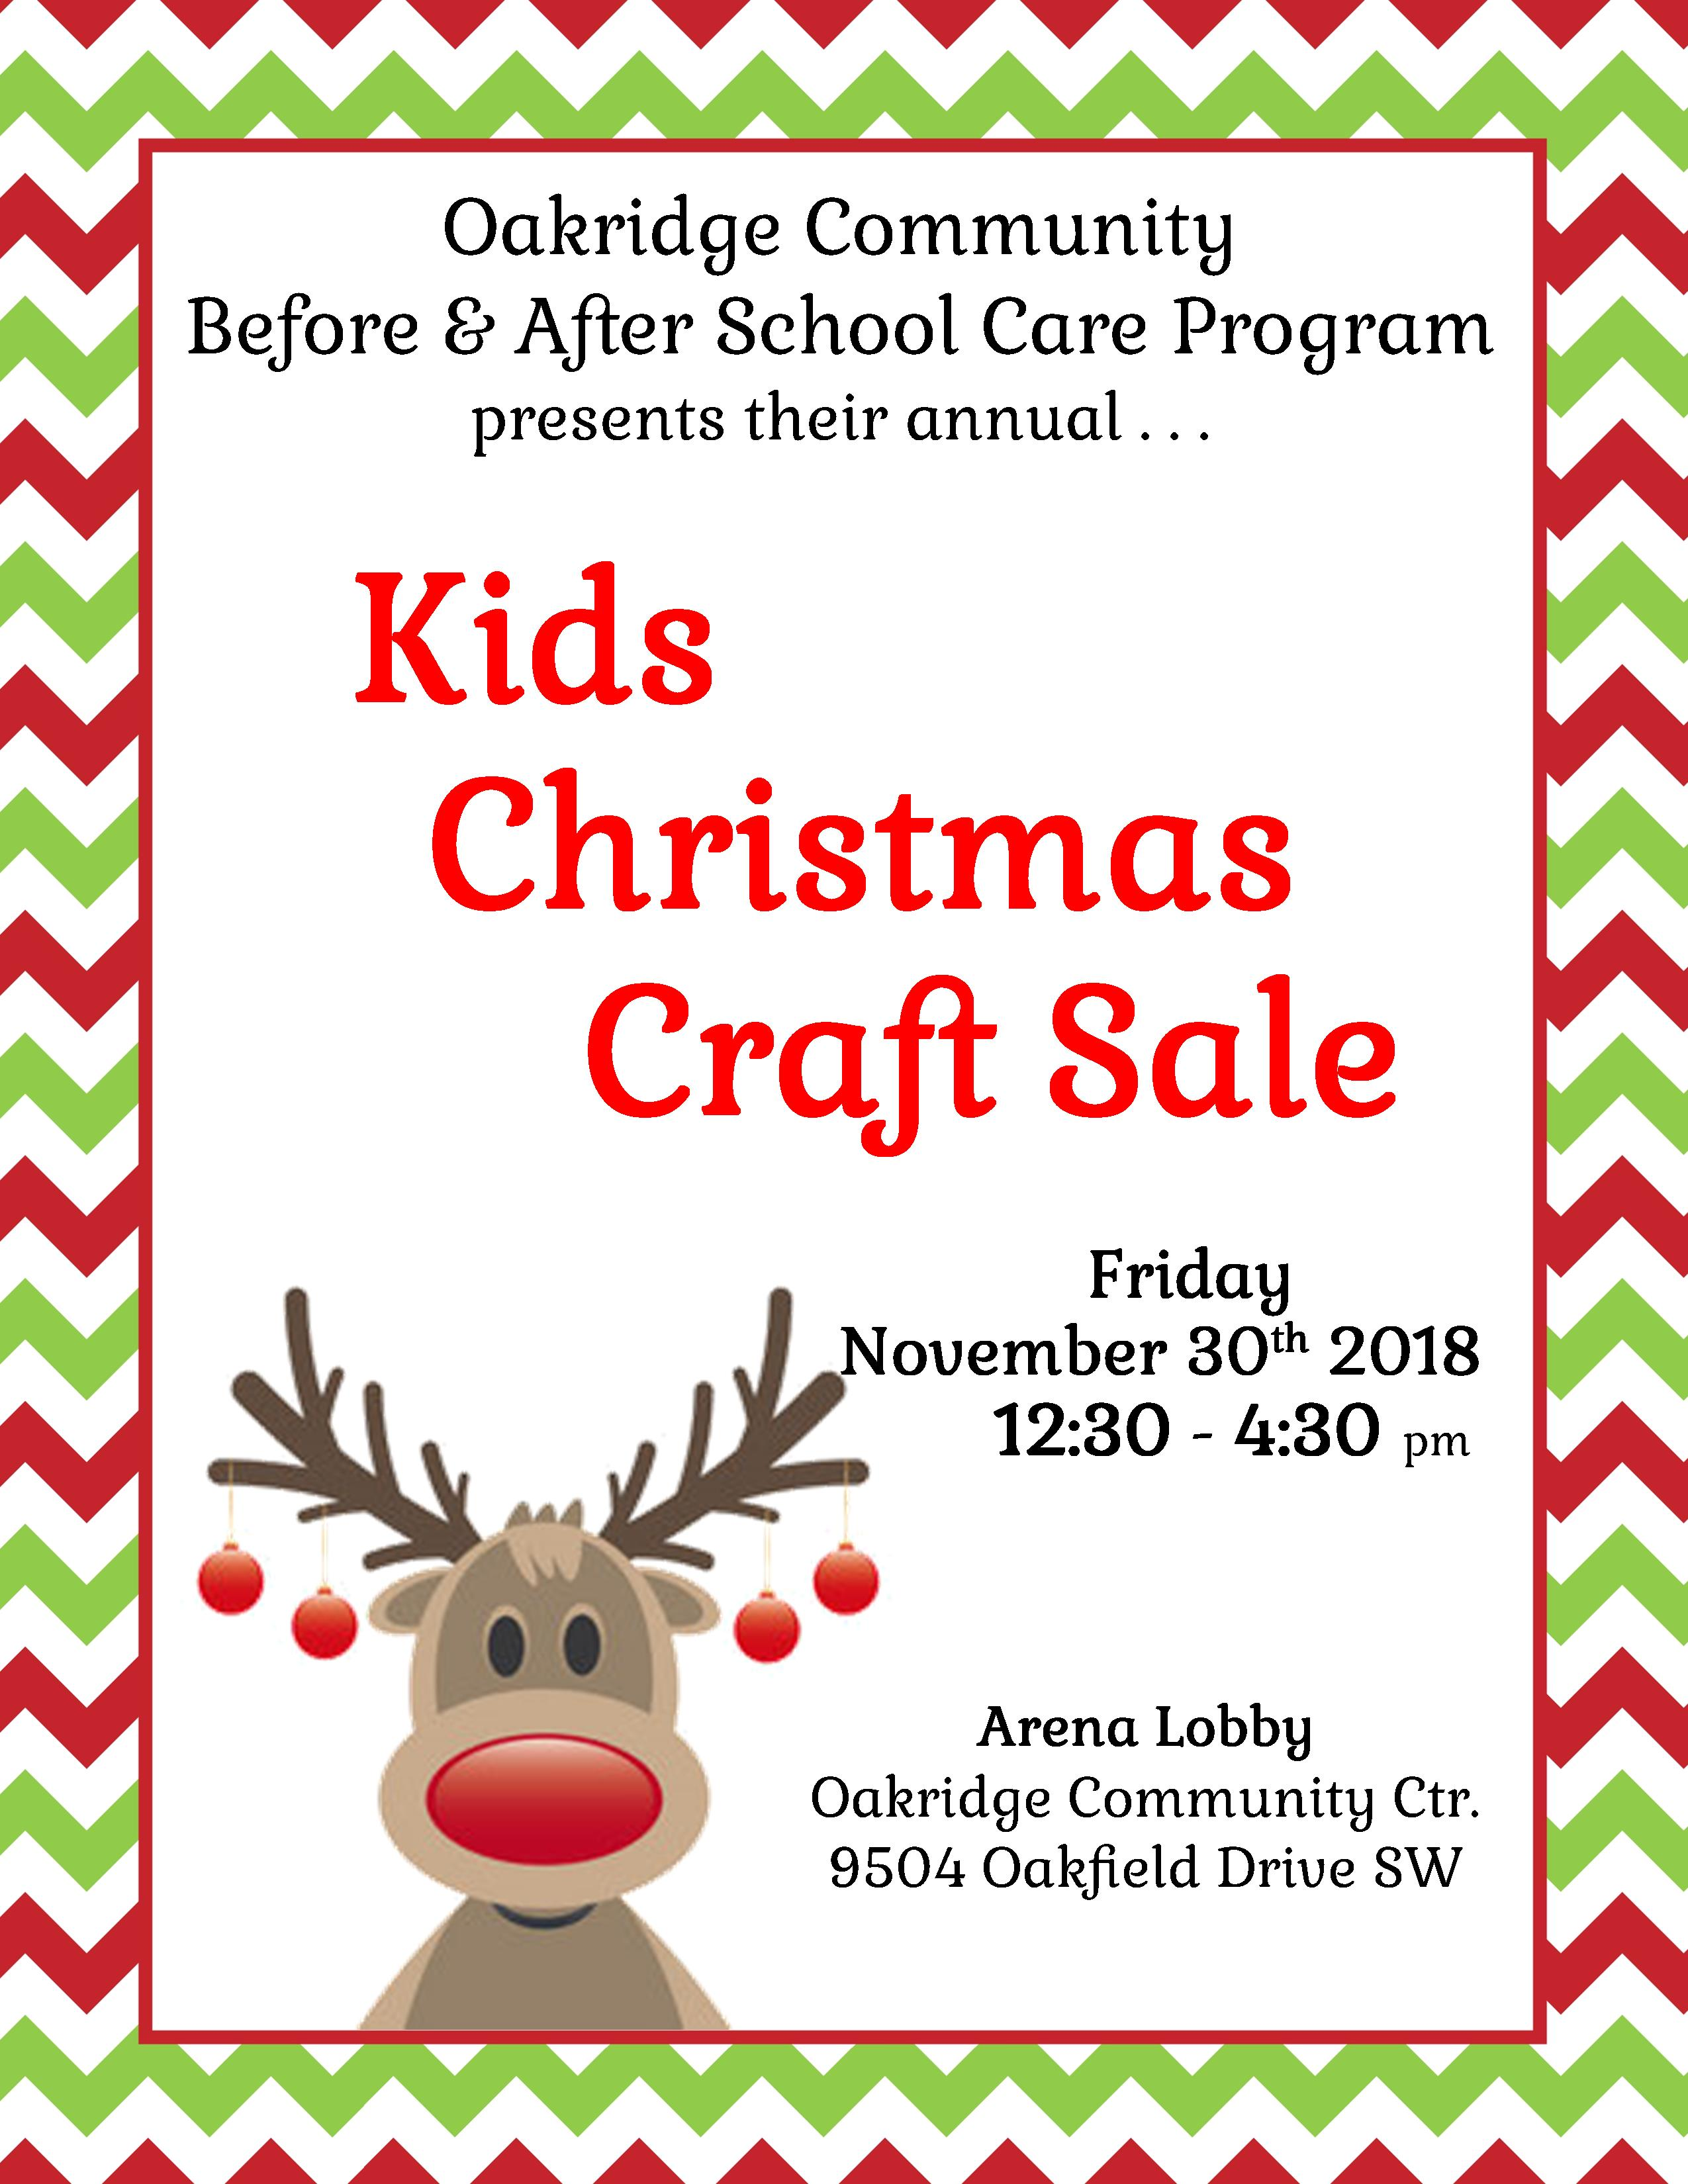 2018 kids christmas craft sale poster